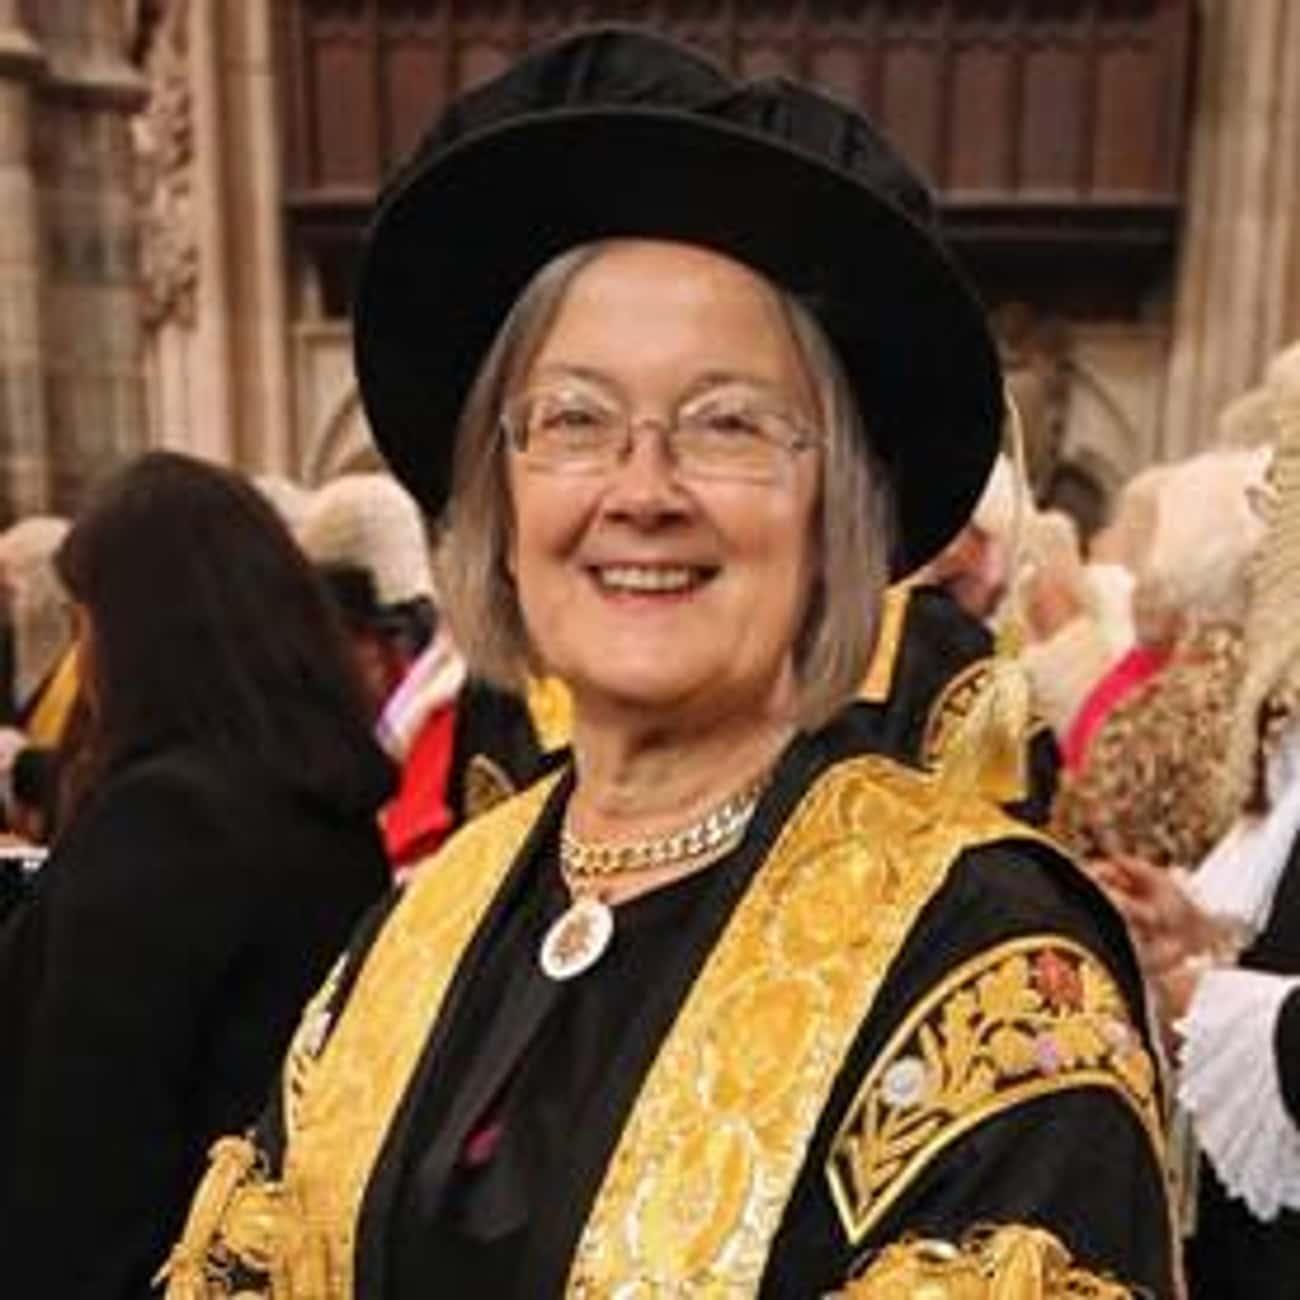 Brenda Hale, Baroness Hale of Richmond